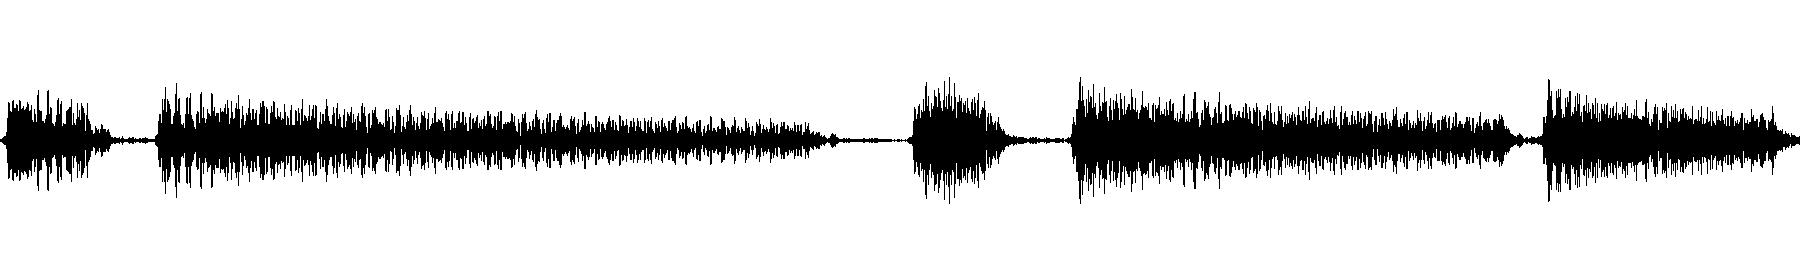 blbc cleangretsch 95 c